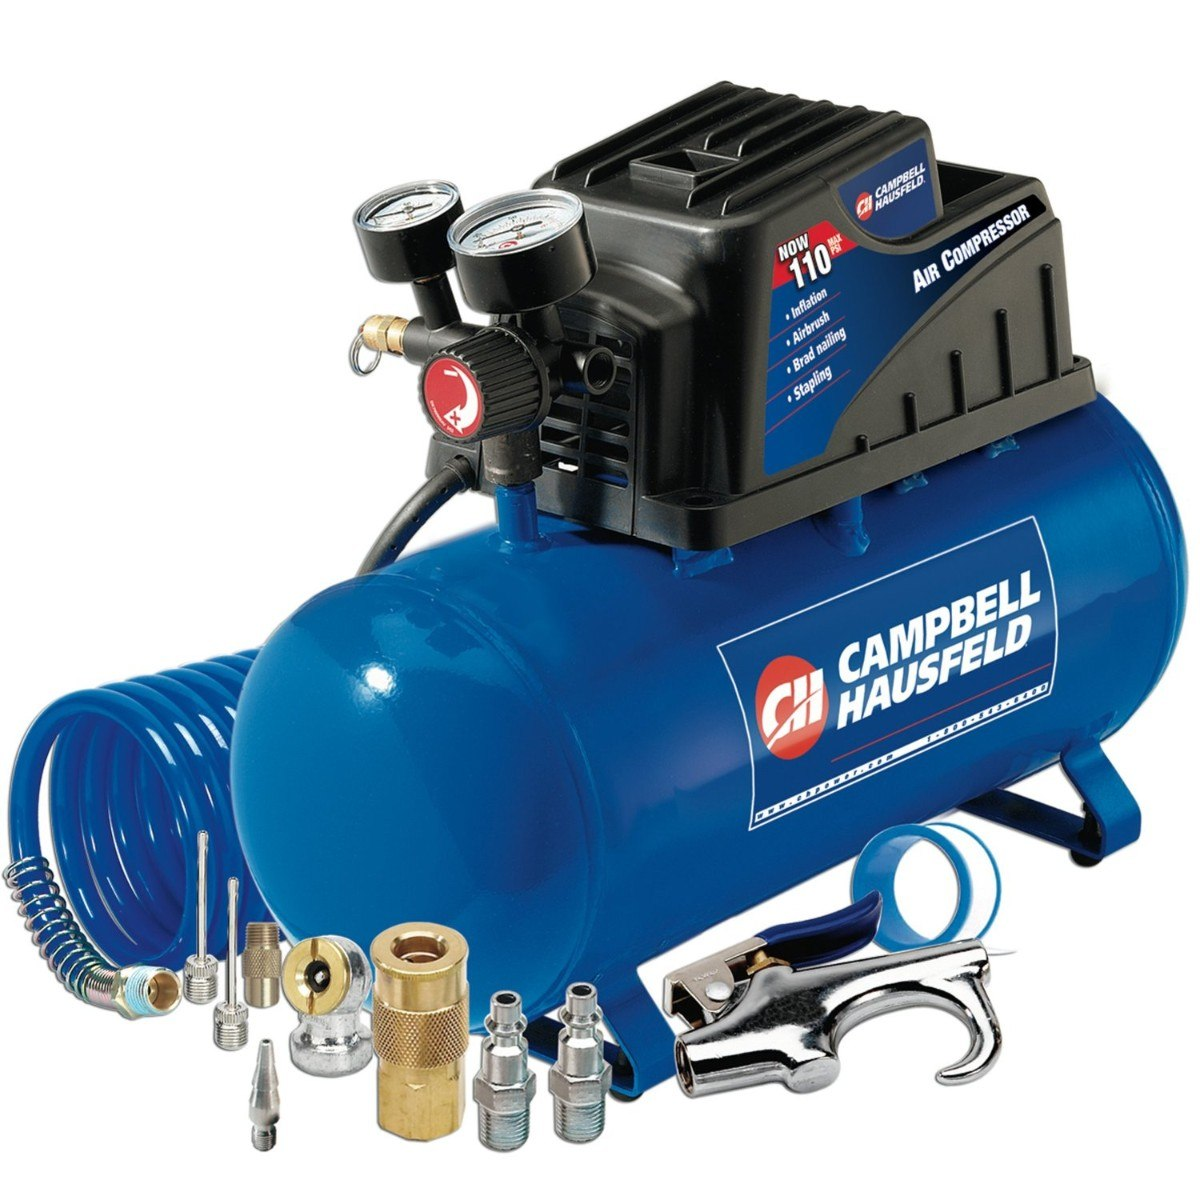 Compresor de aire 3 galones 100 psi campbell hausfeld maa - Manguera para compresor de aire ...